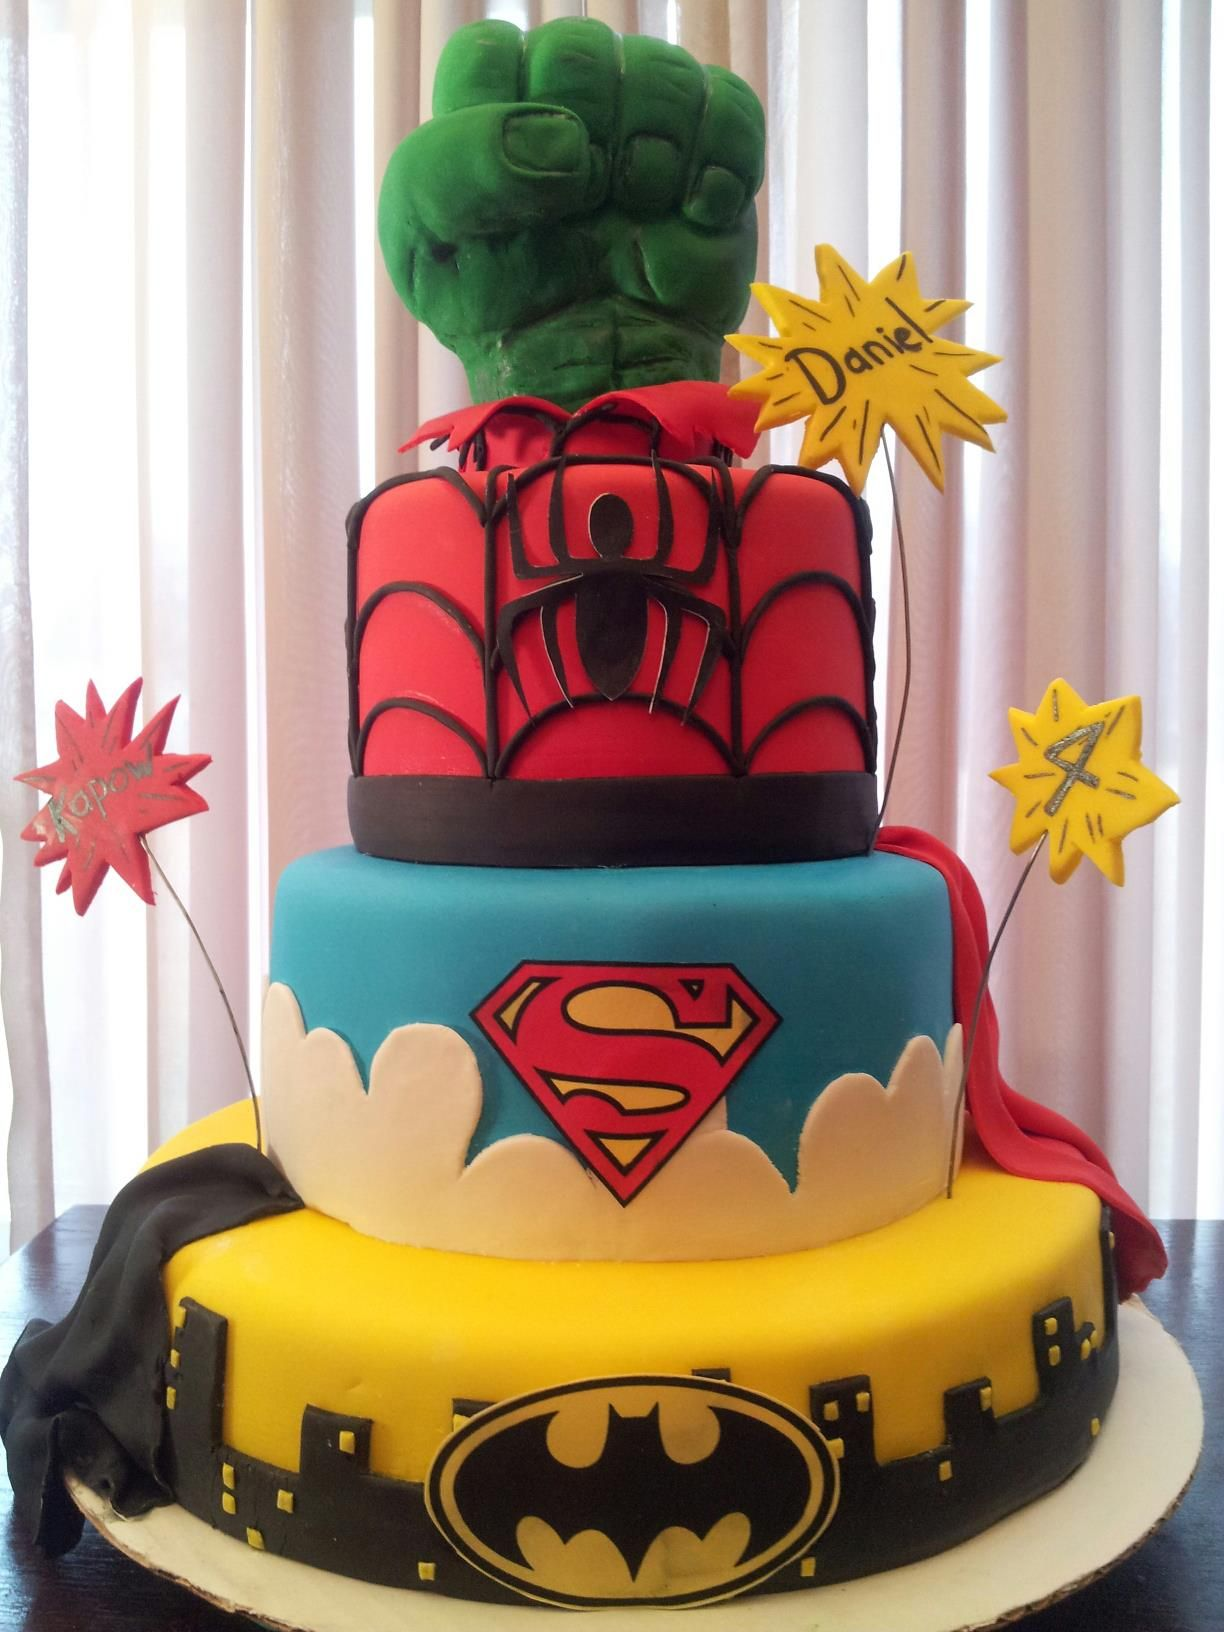 Super Hero Cake A Birthday Boys Cake (boys cake